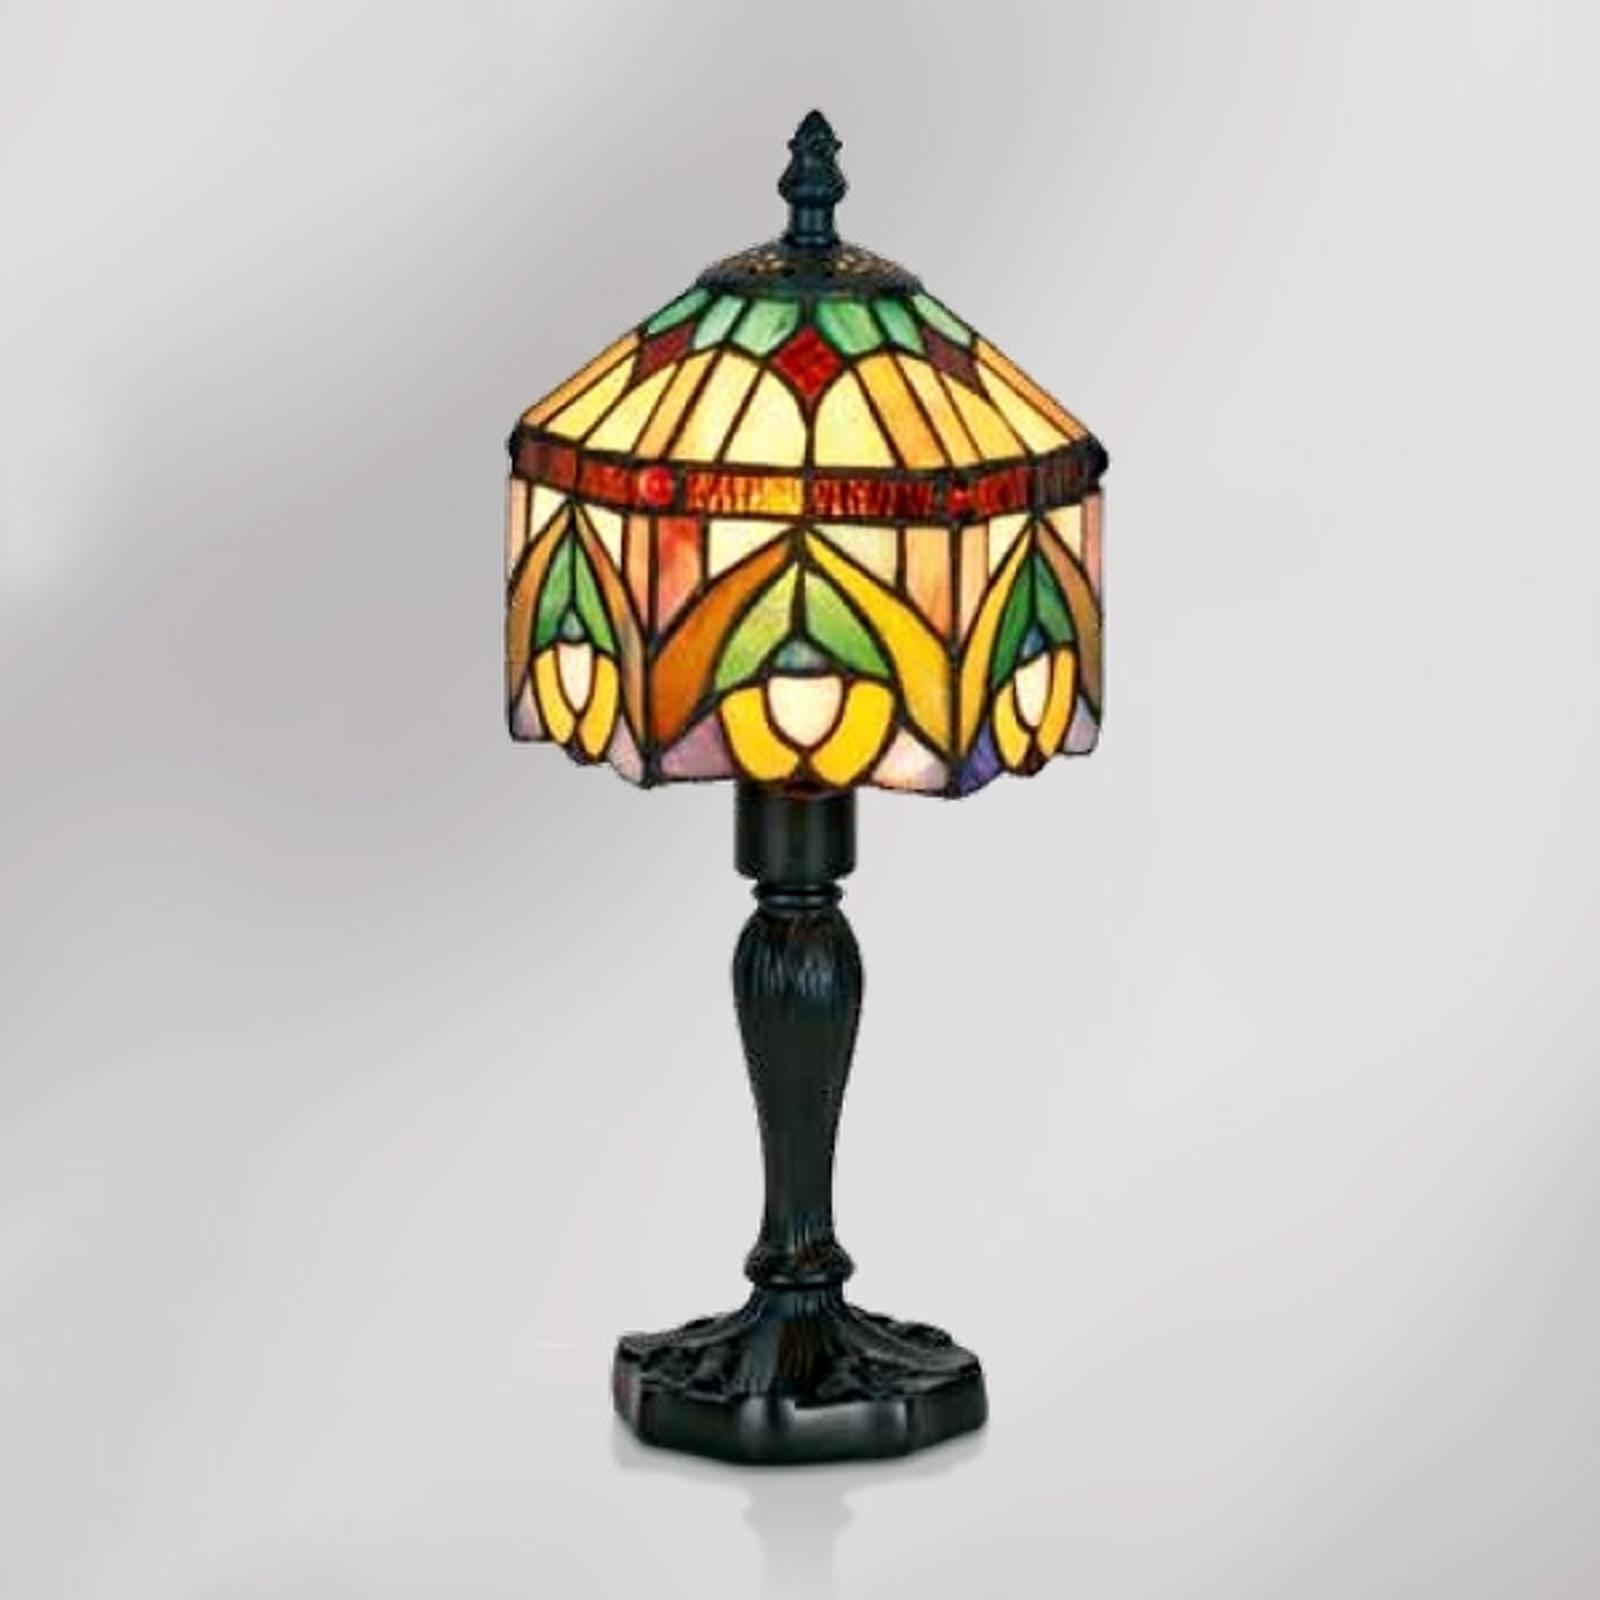 Lampe à poser décorative Jamilia style Tiffany